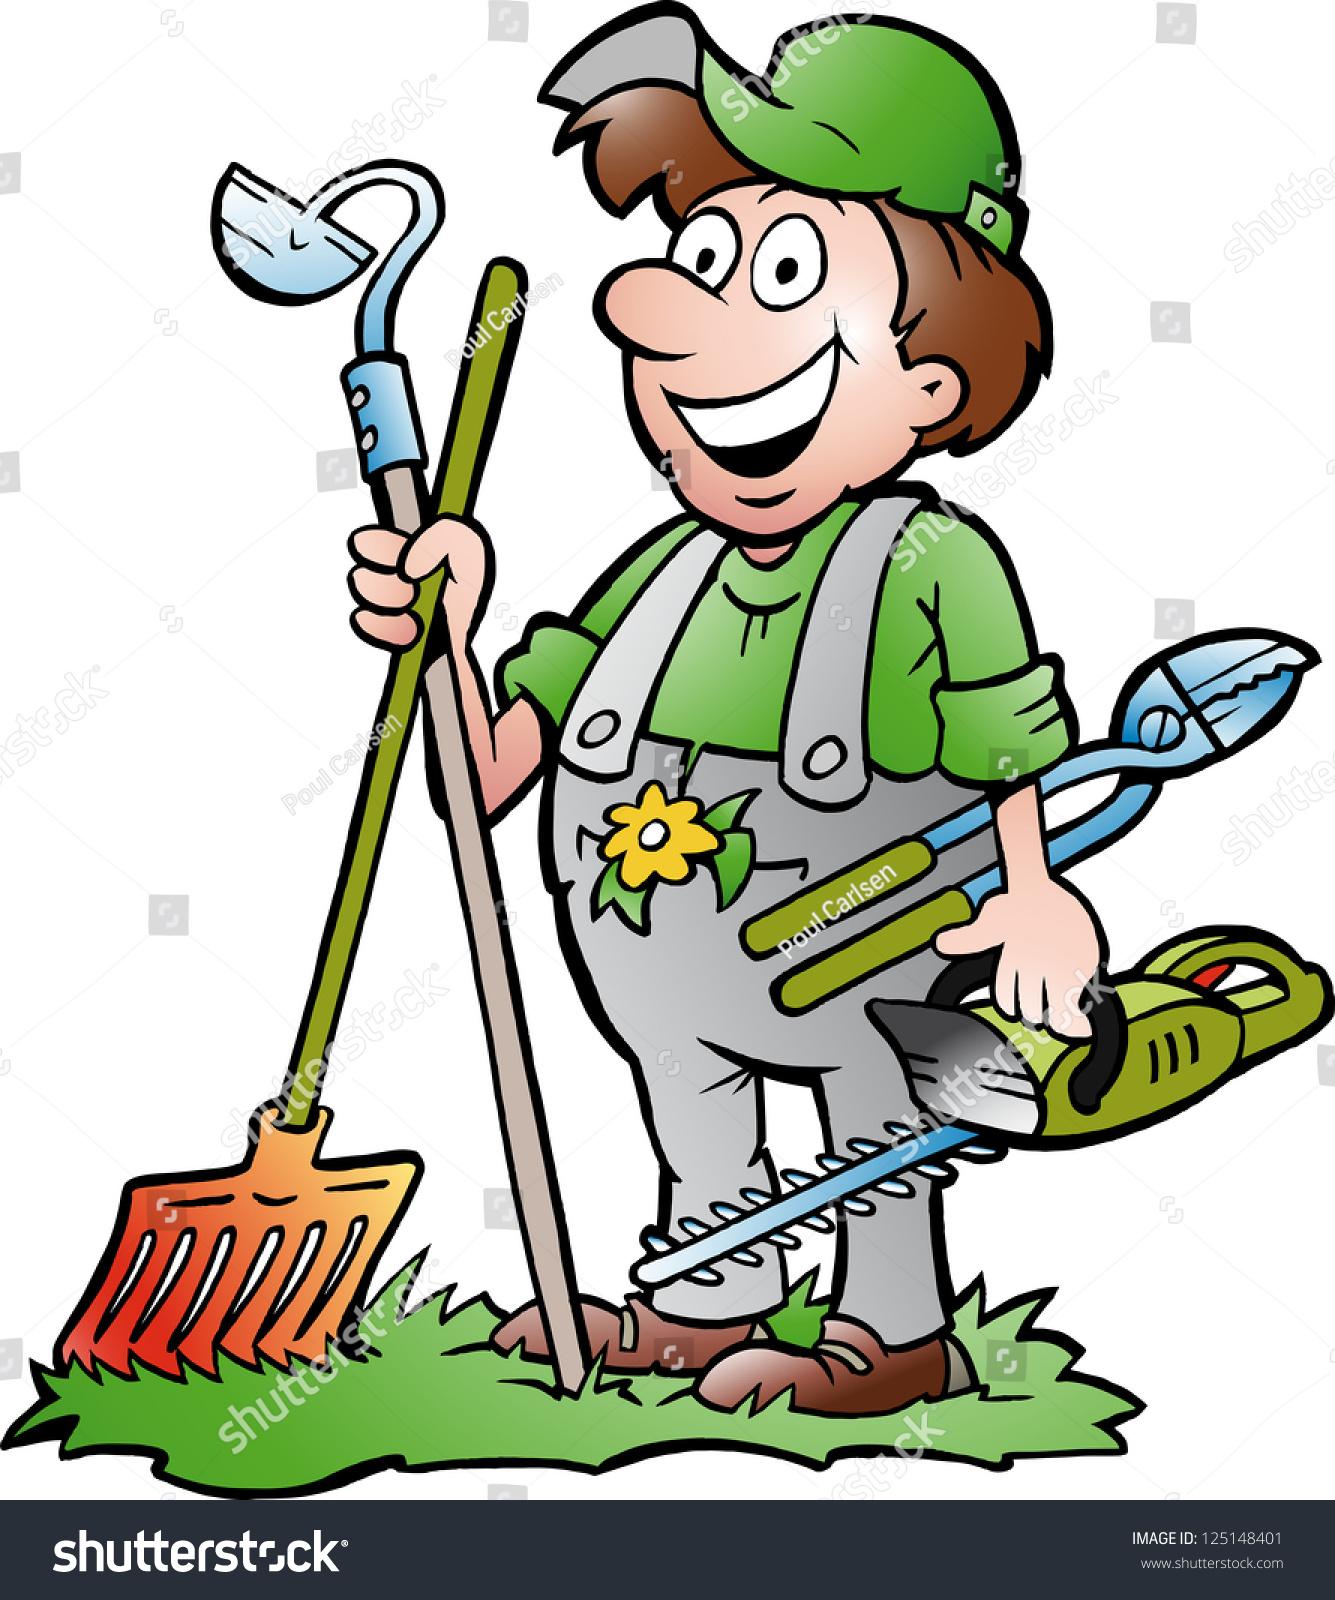 stock vector hand drawn vector illustration of an happy gardener standing with his garden tool